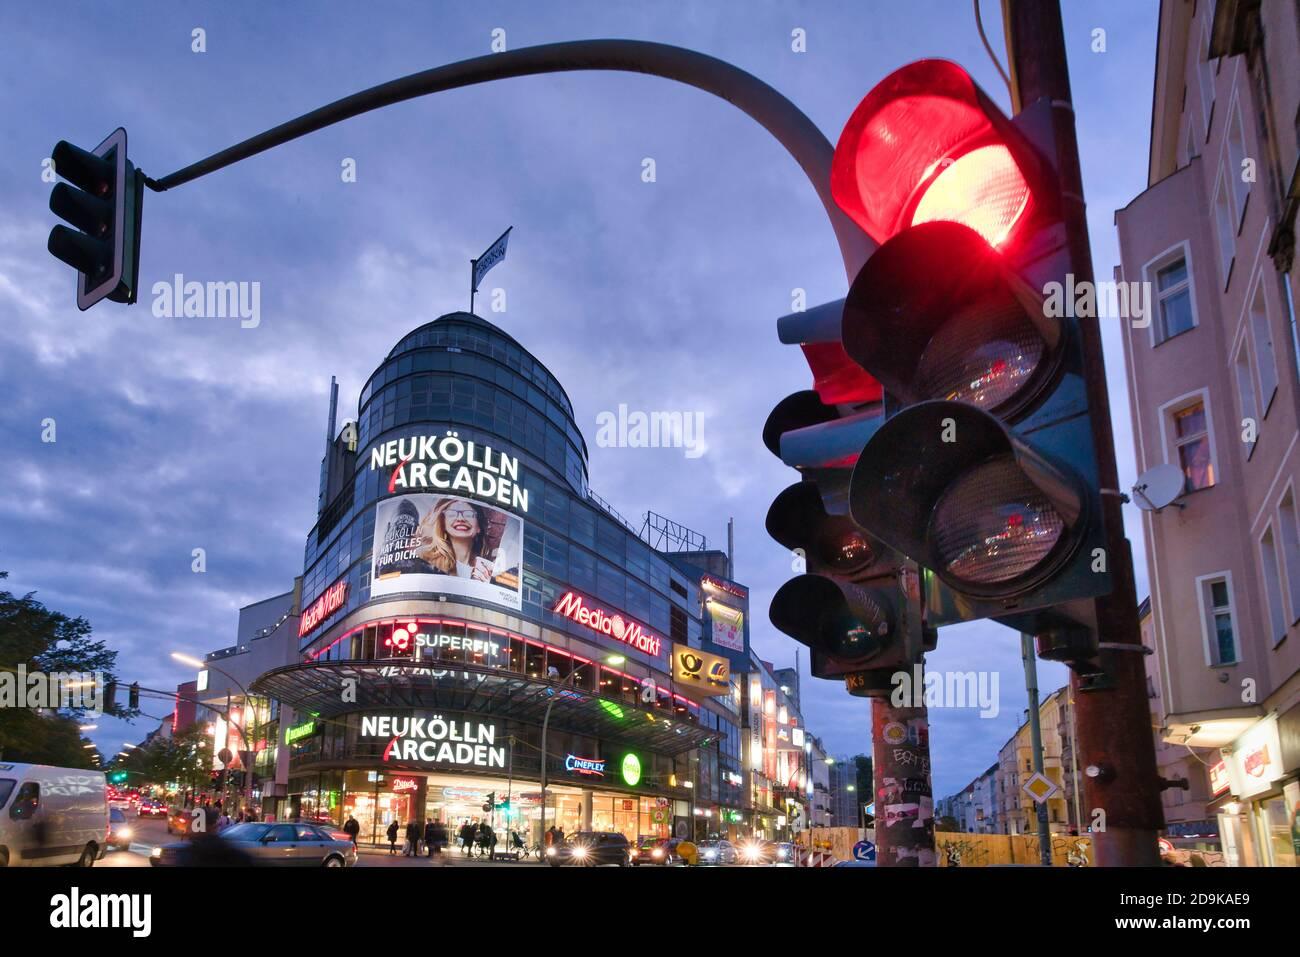 Karl-Marx-Strasse, Neukölln Akaden, Corona Hotspot, Corona, Ampel auf rot, Foto de stock